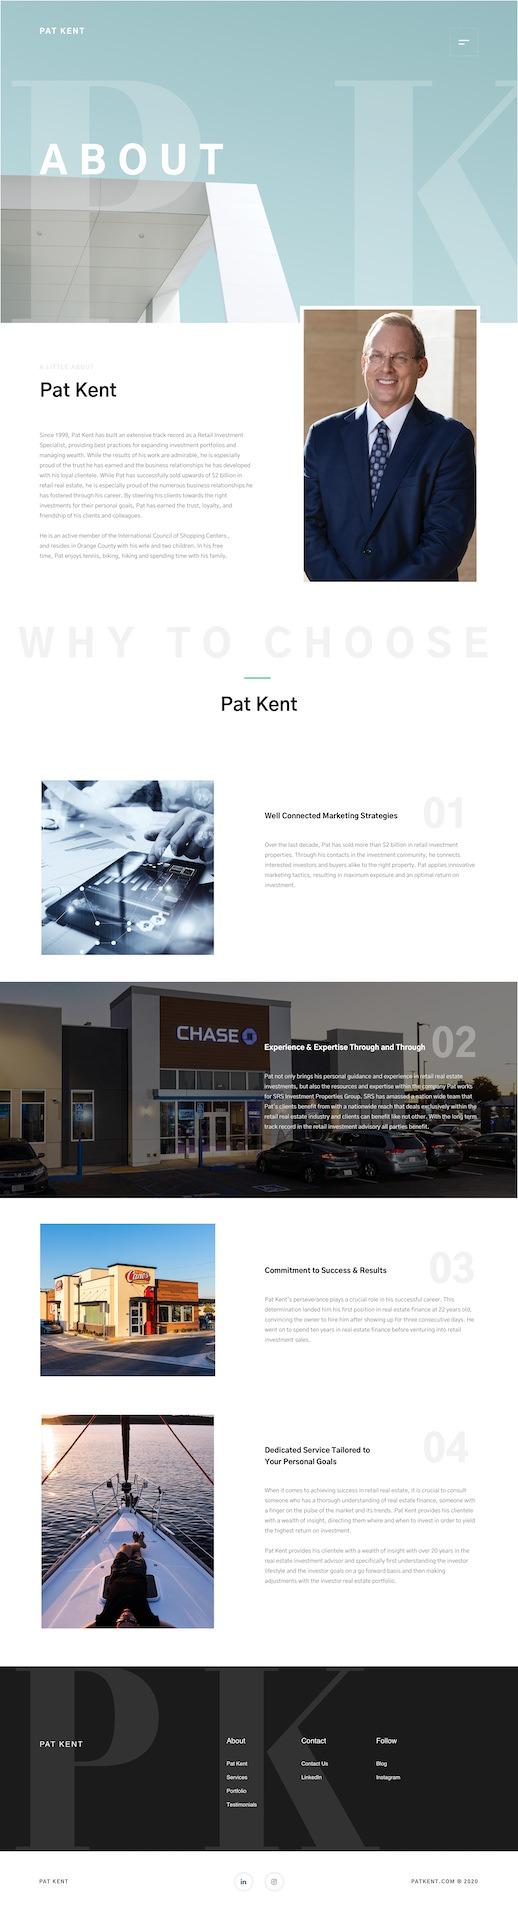 Dorian Media - Website Design - Pat Kent - About